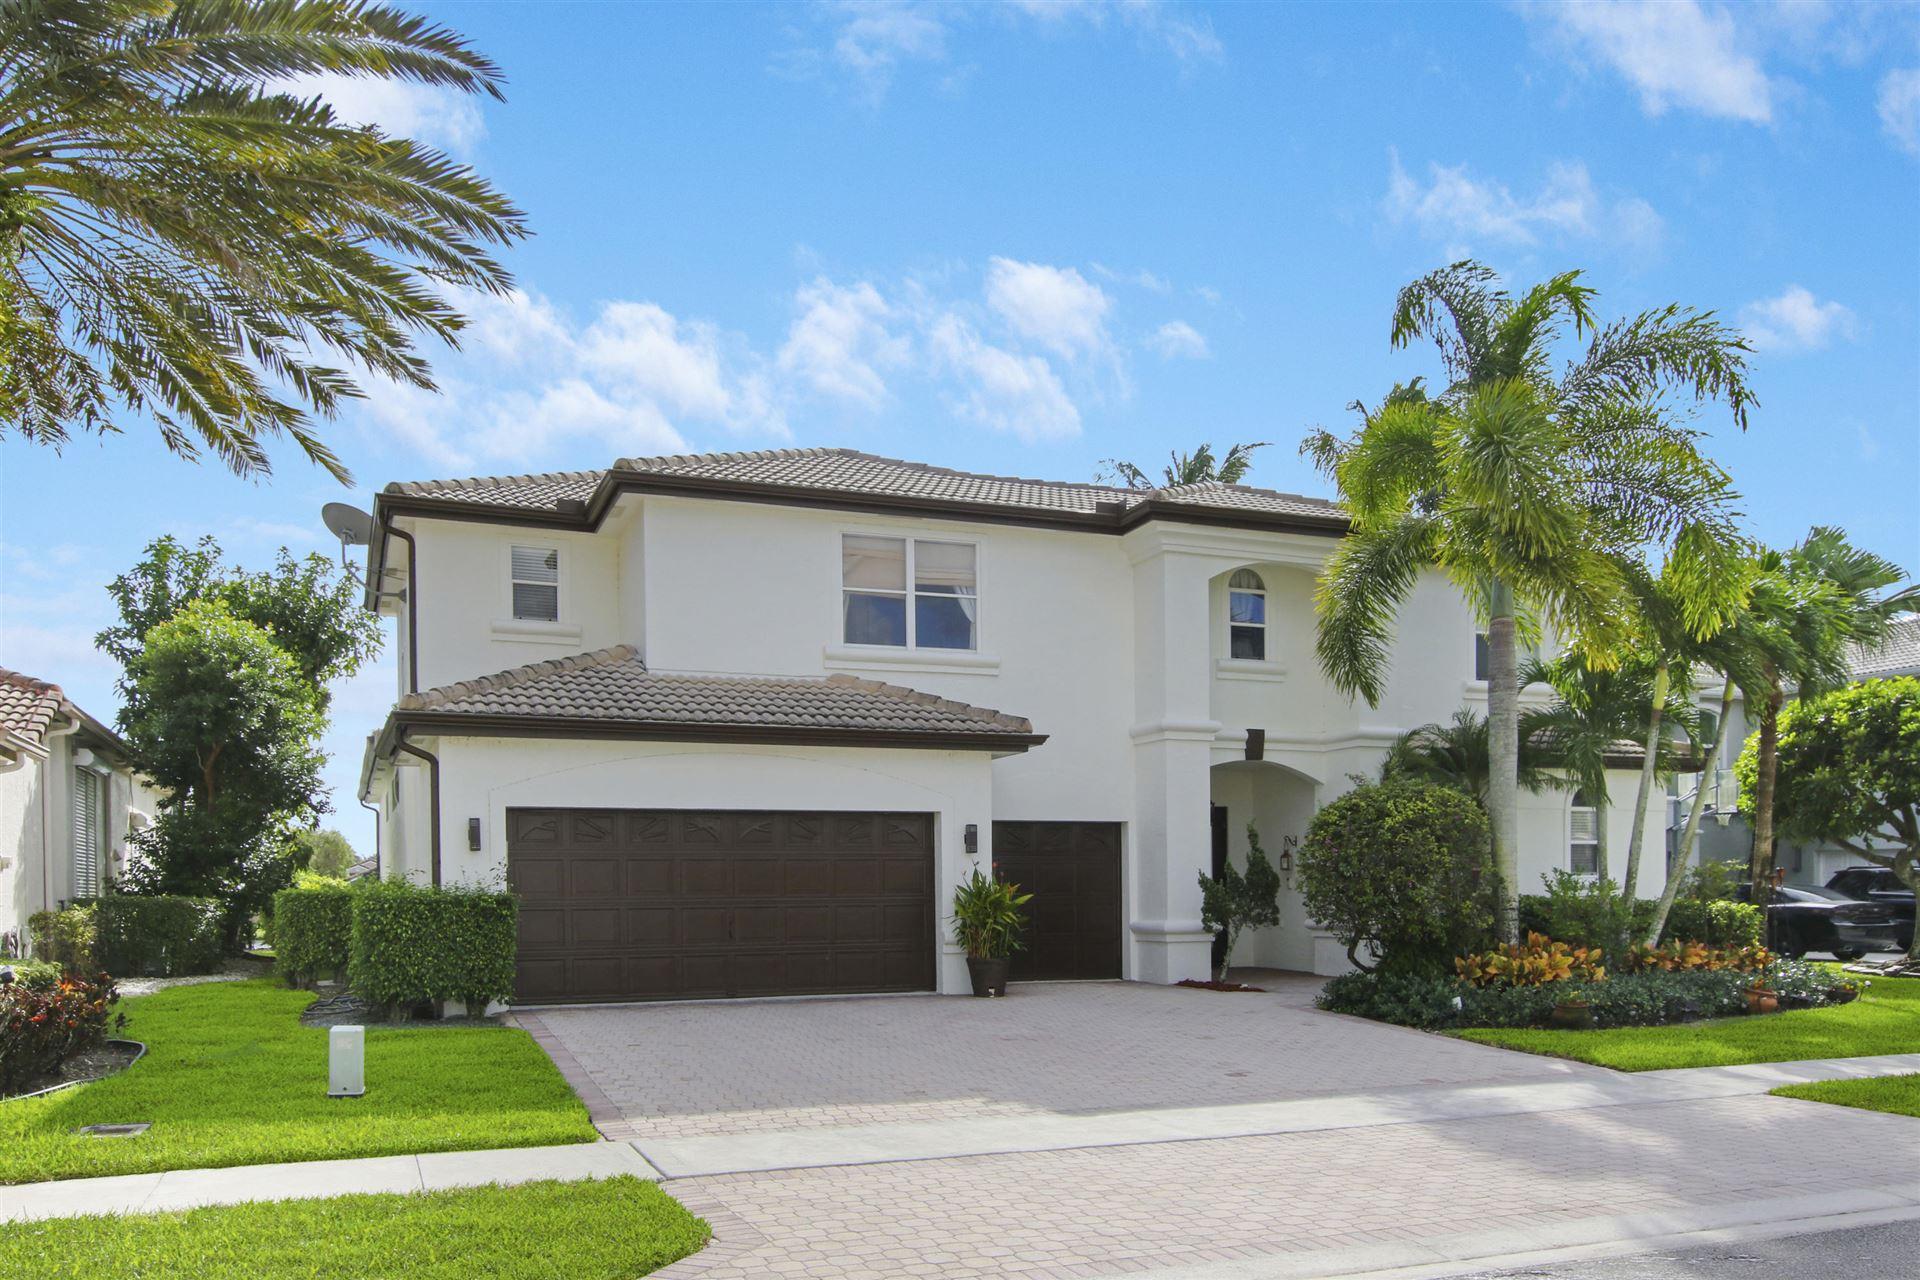 11066 Blue Coral Drive, Boca Raton, FL 33498 - #: RX-10673027